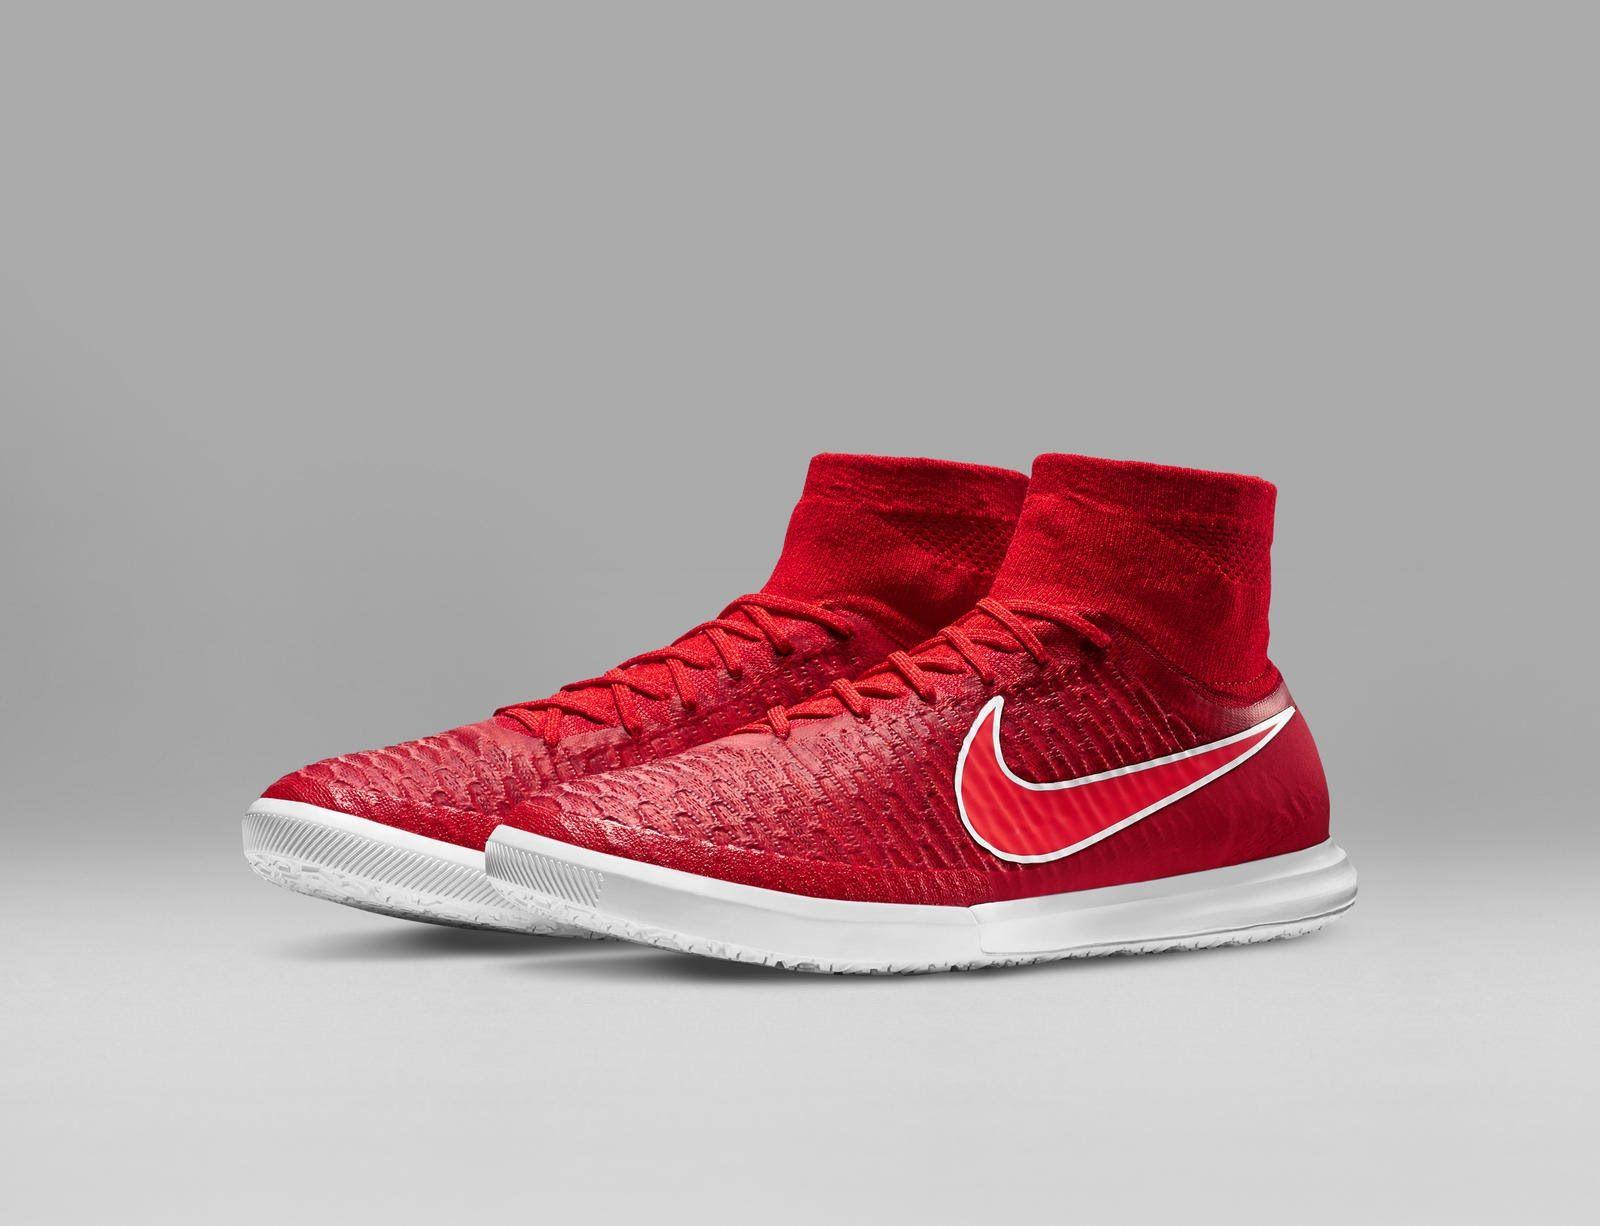 6a57441a13 Futsal Shoes Nike Colorways Pack | Nike Mercurial Victory V futsal ...